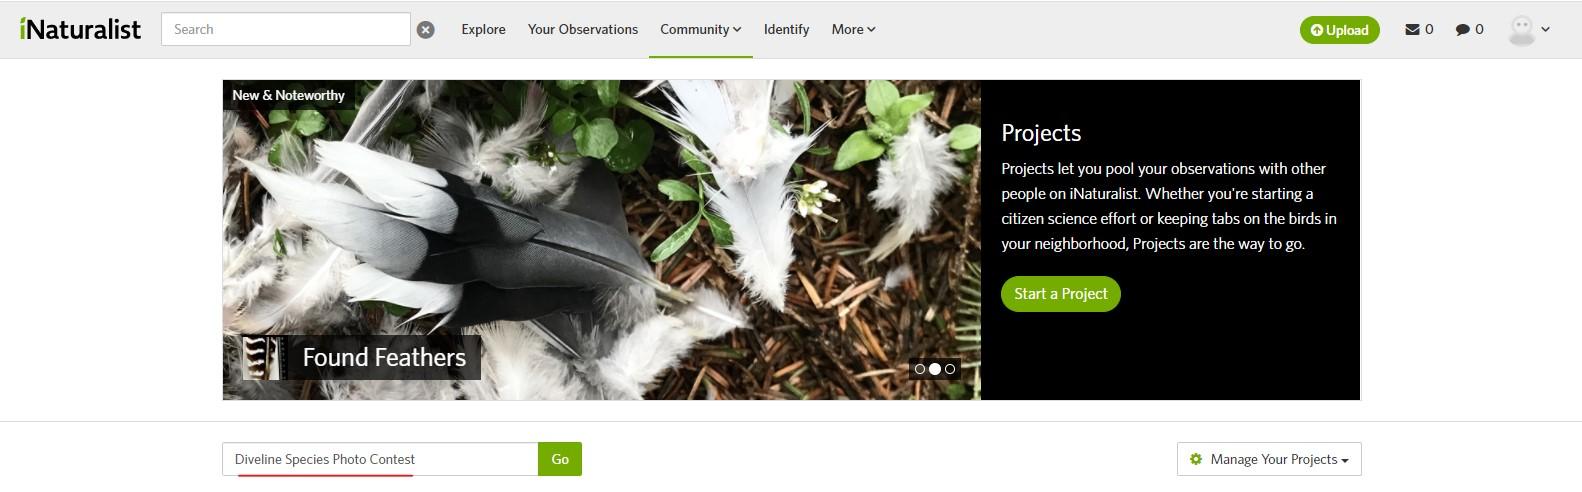 Find Diveline Species Photo Contest